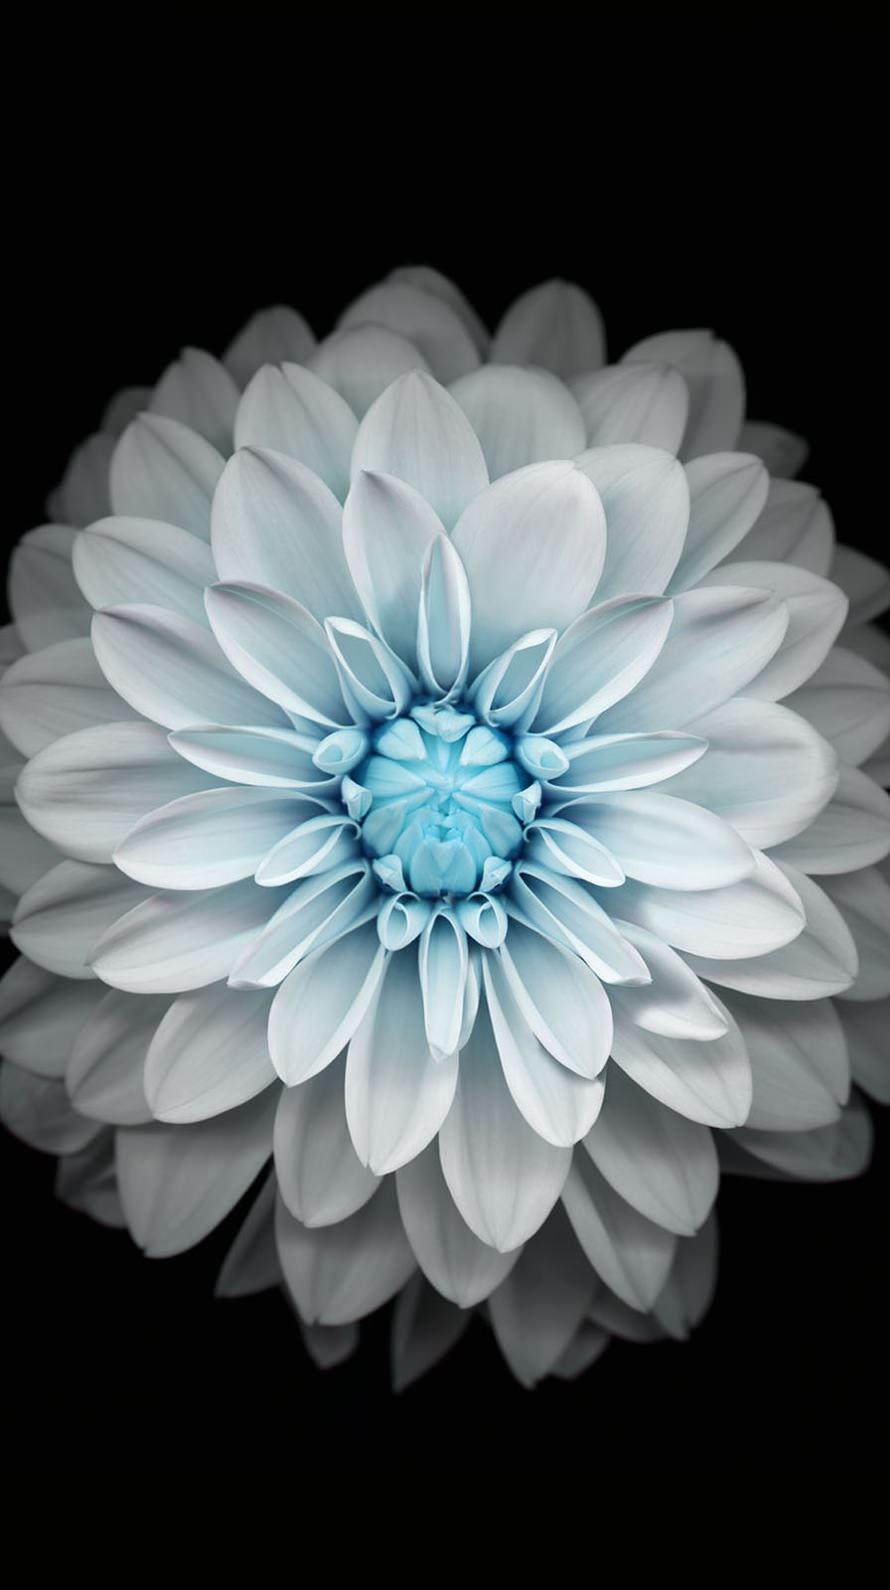 Image Result For Black And White Flower Wallpaper Beautiful Floral Black And White Wallpaper